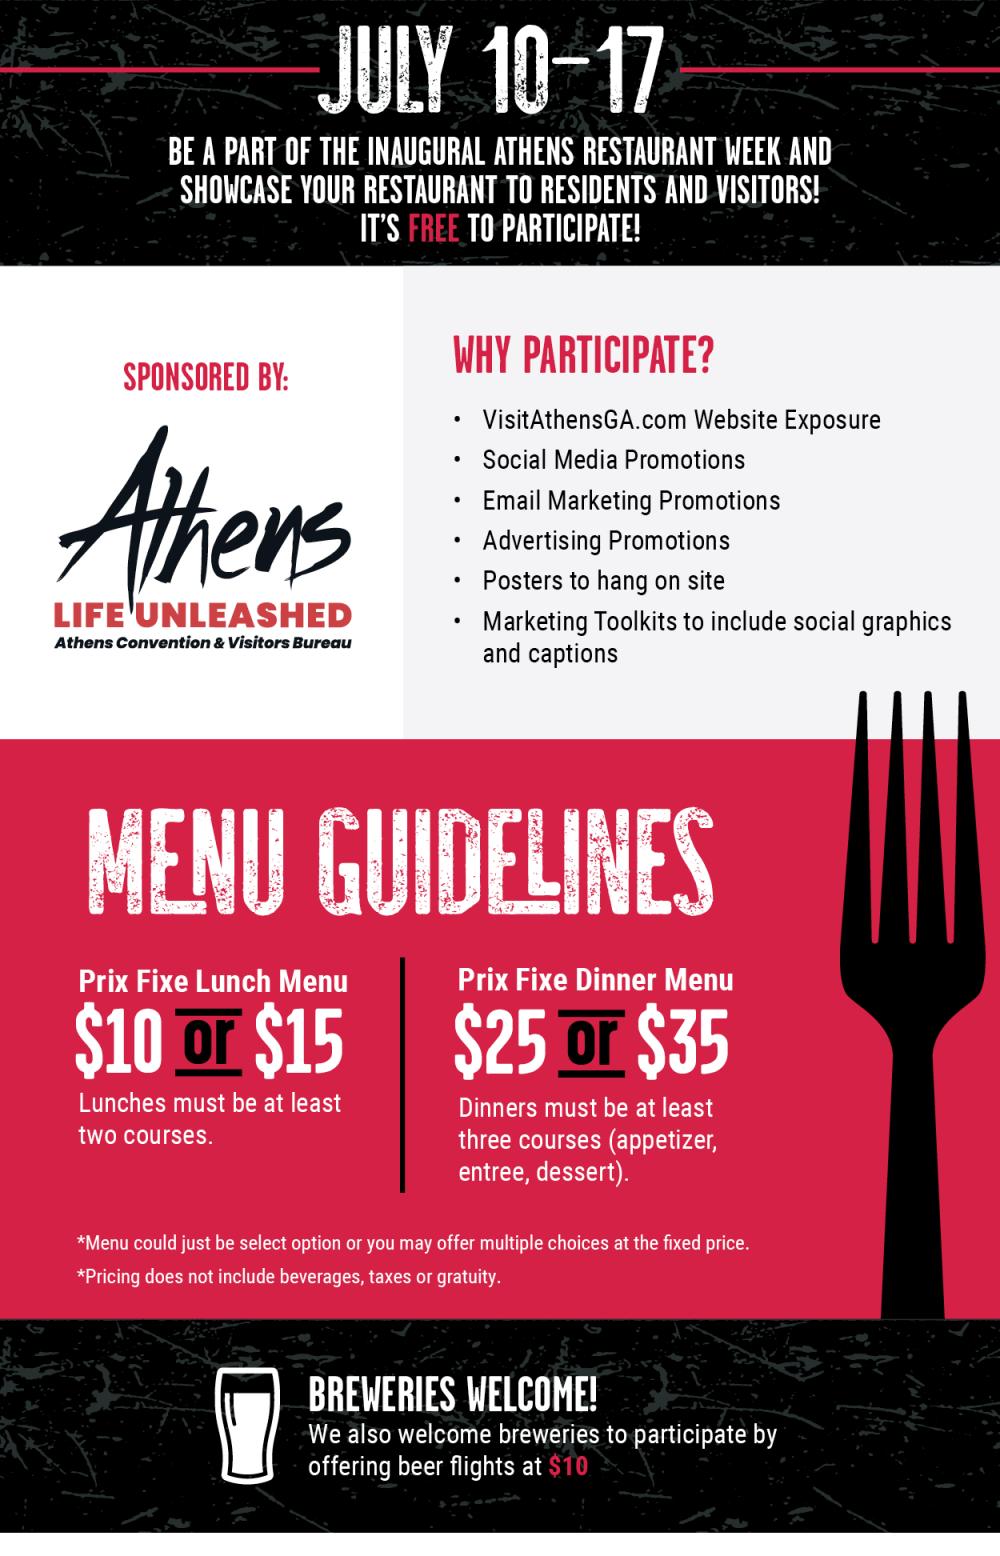 ARW Restaurant promo no deadline